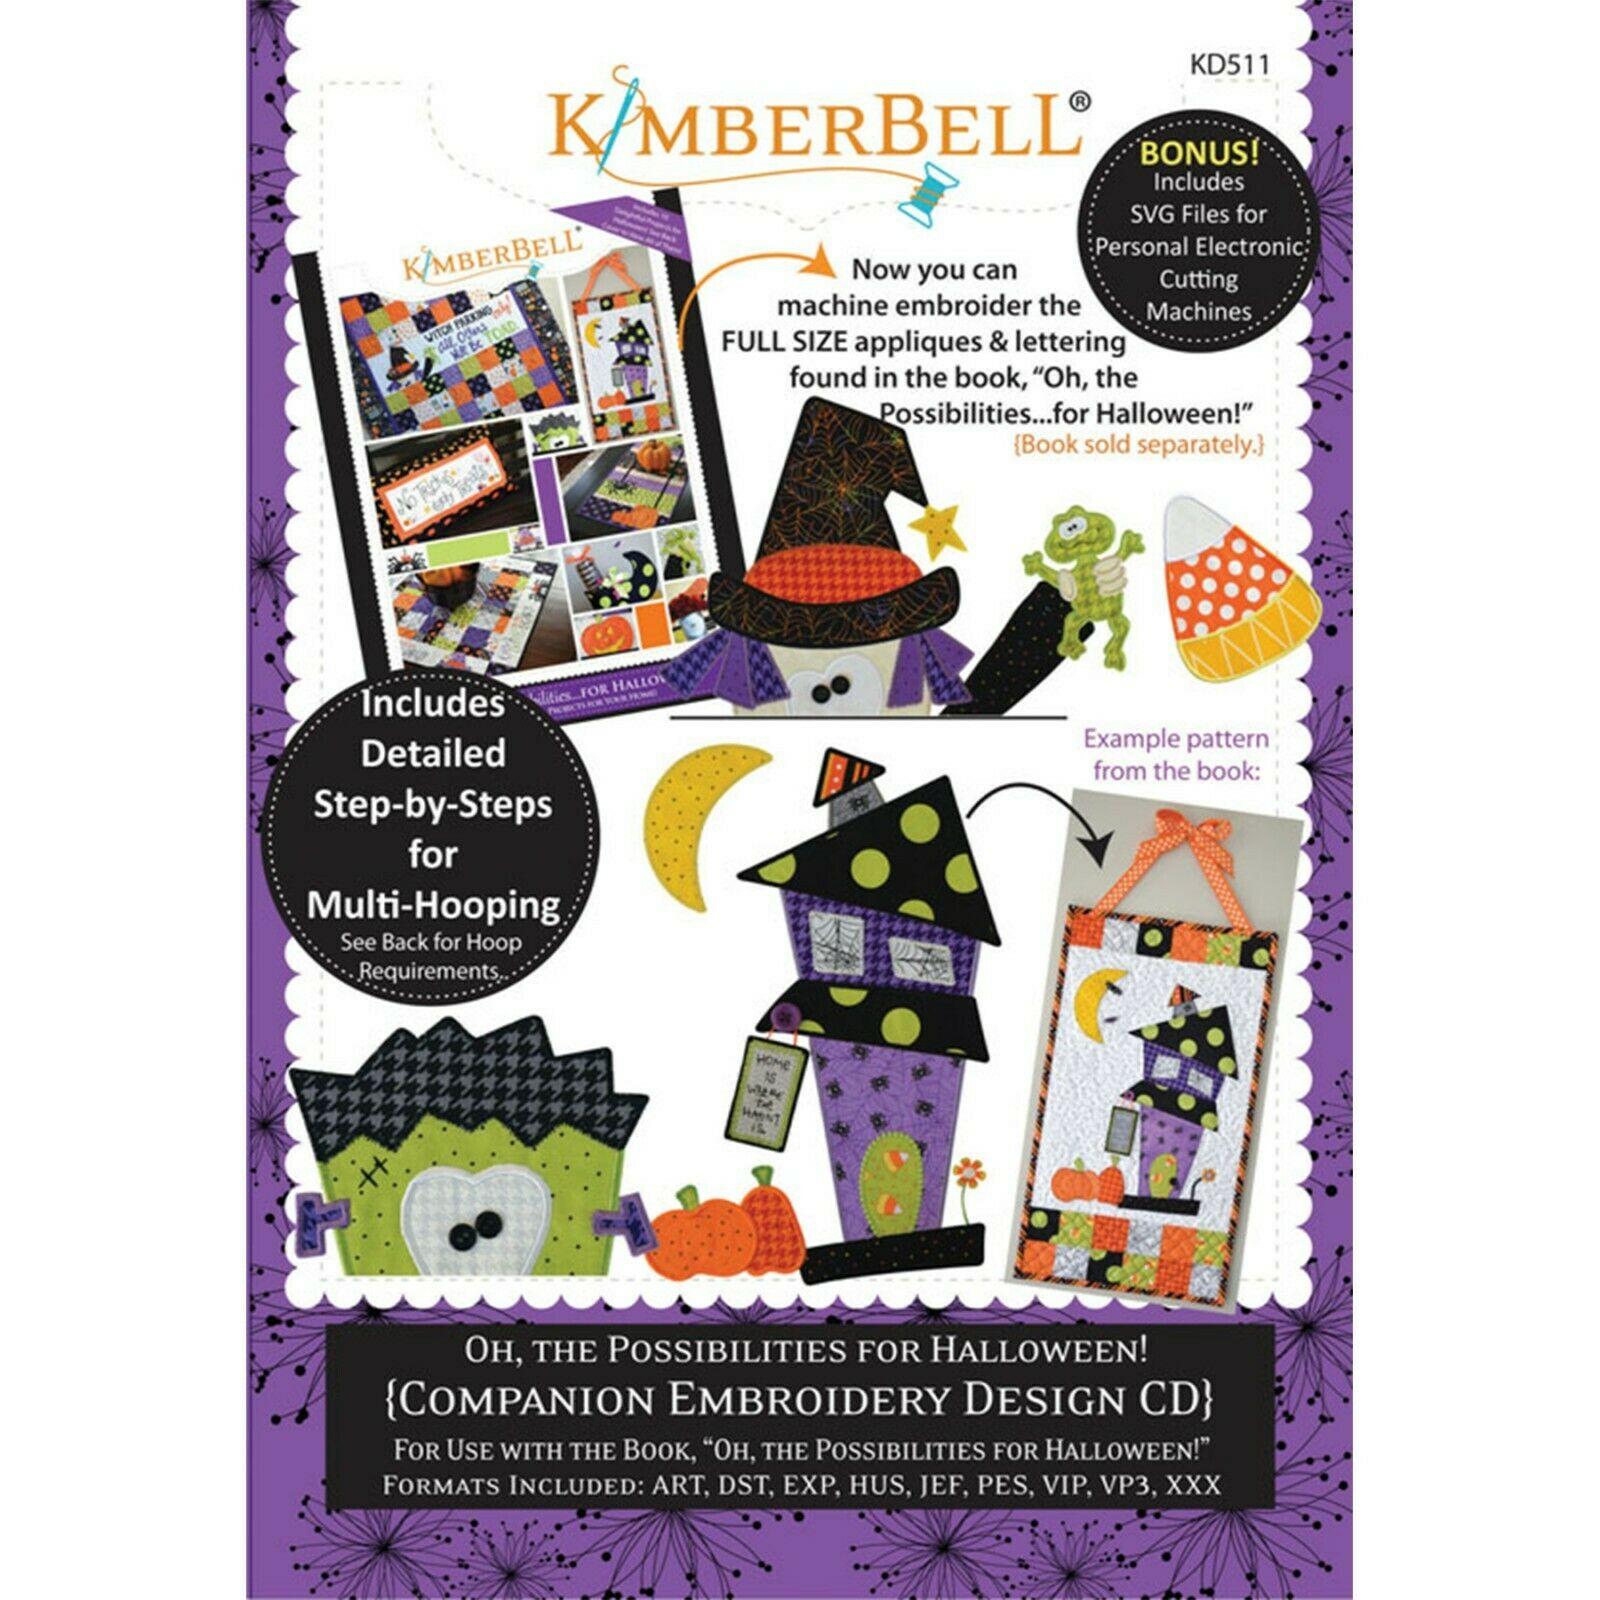 KIMBERBELLOH THE POSSIBILITIES FOR HALLOWEEN – COMPANION EMBROIDERY DESIGN CD